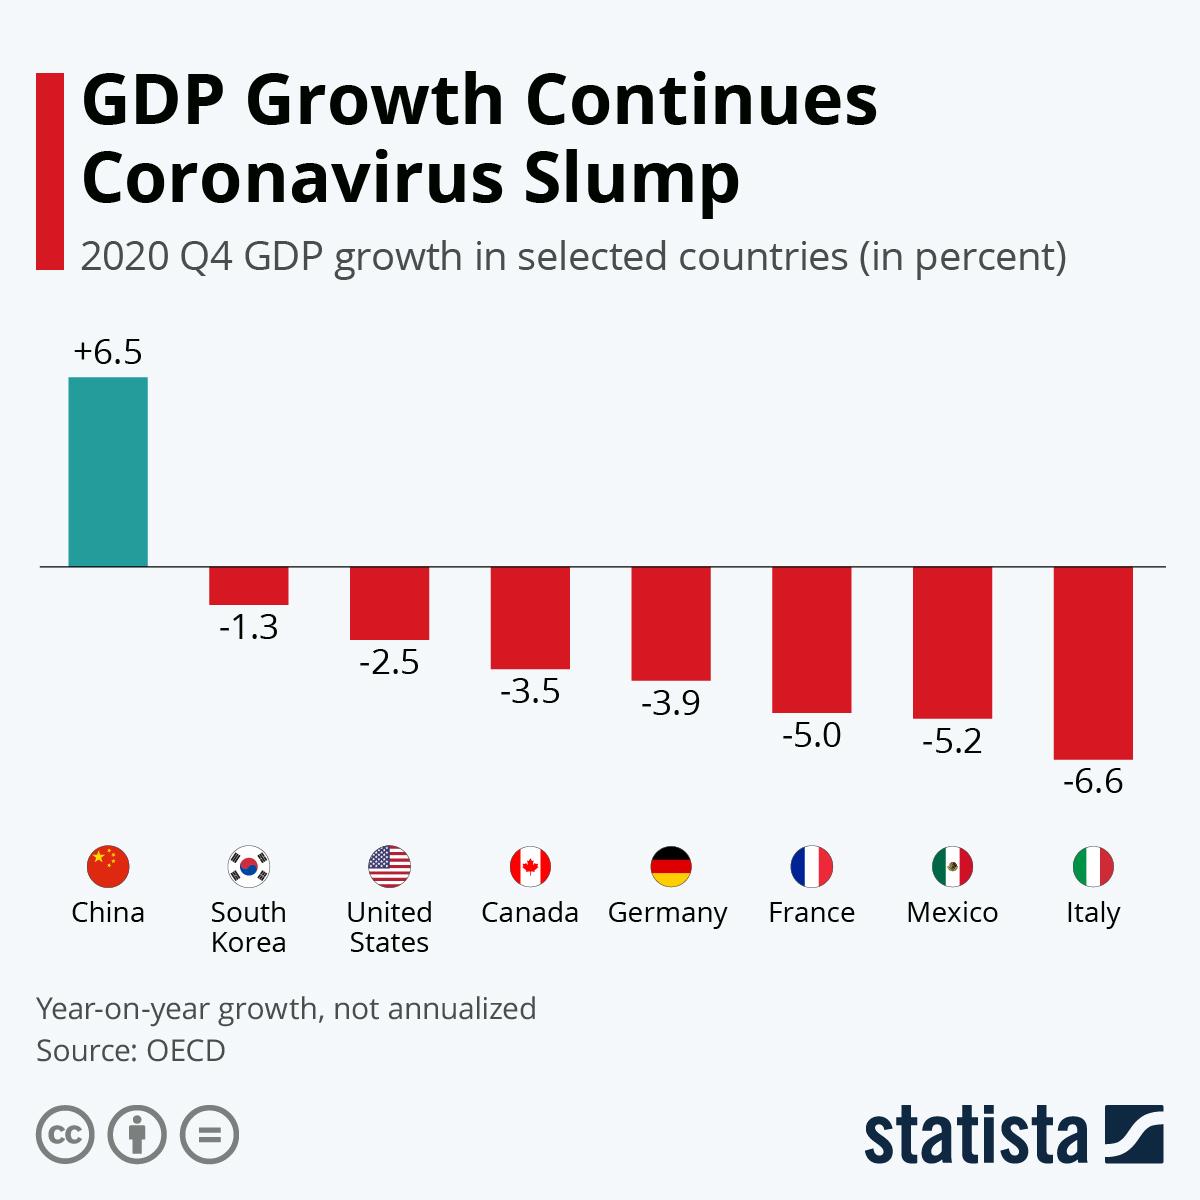 GDP Growth Continues Coronavirus Slump